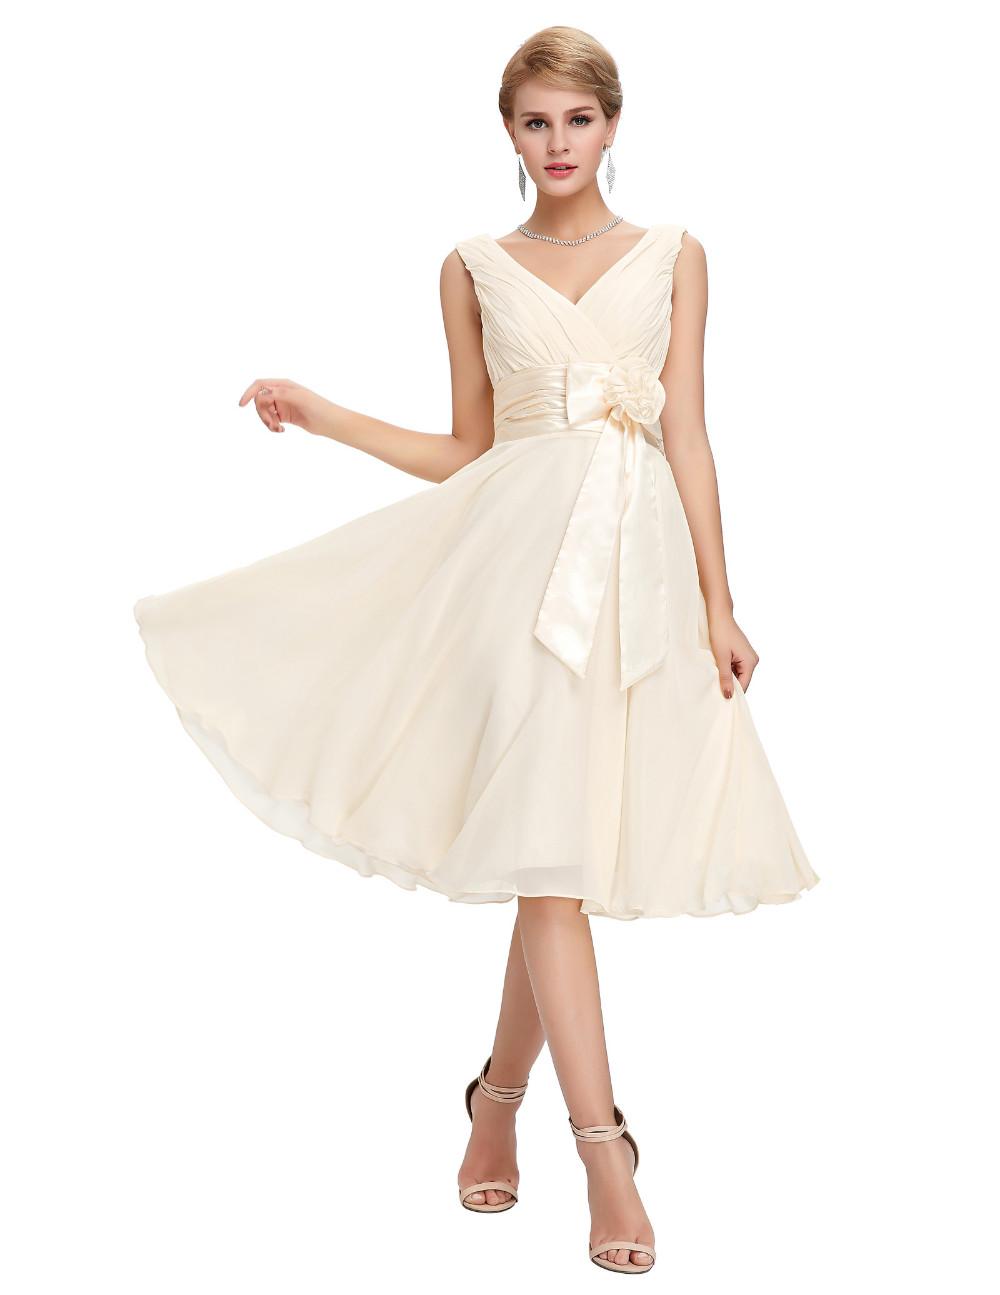 HTB14wUXMVXXXXXPXXXXq6xXFXXXOKnee Length Short Chiffon Blue Dress